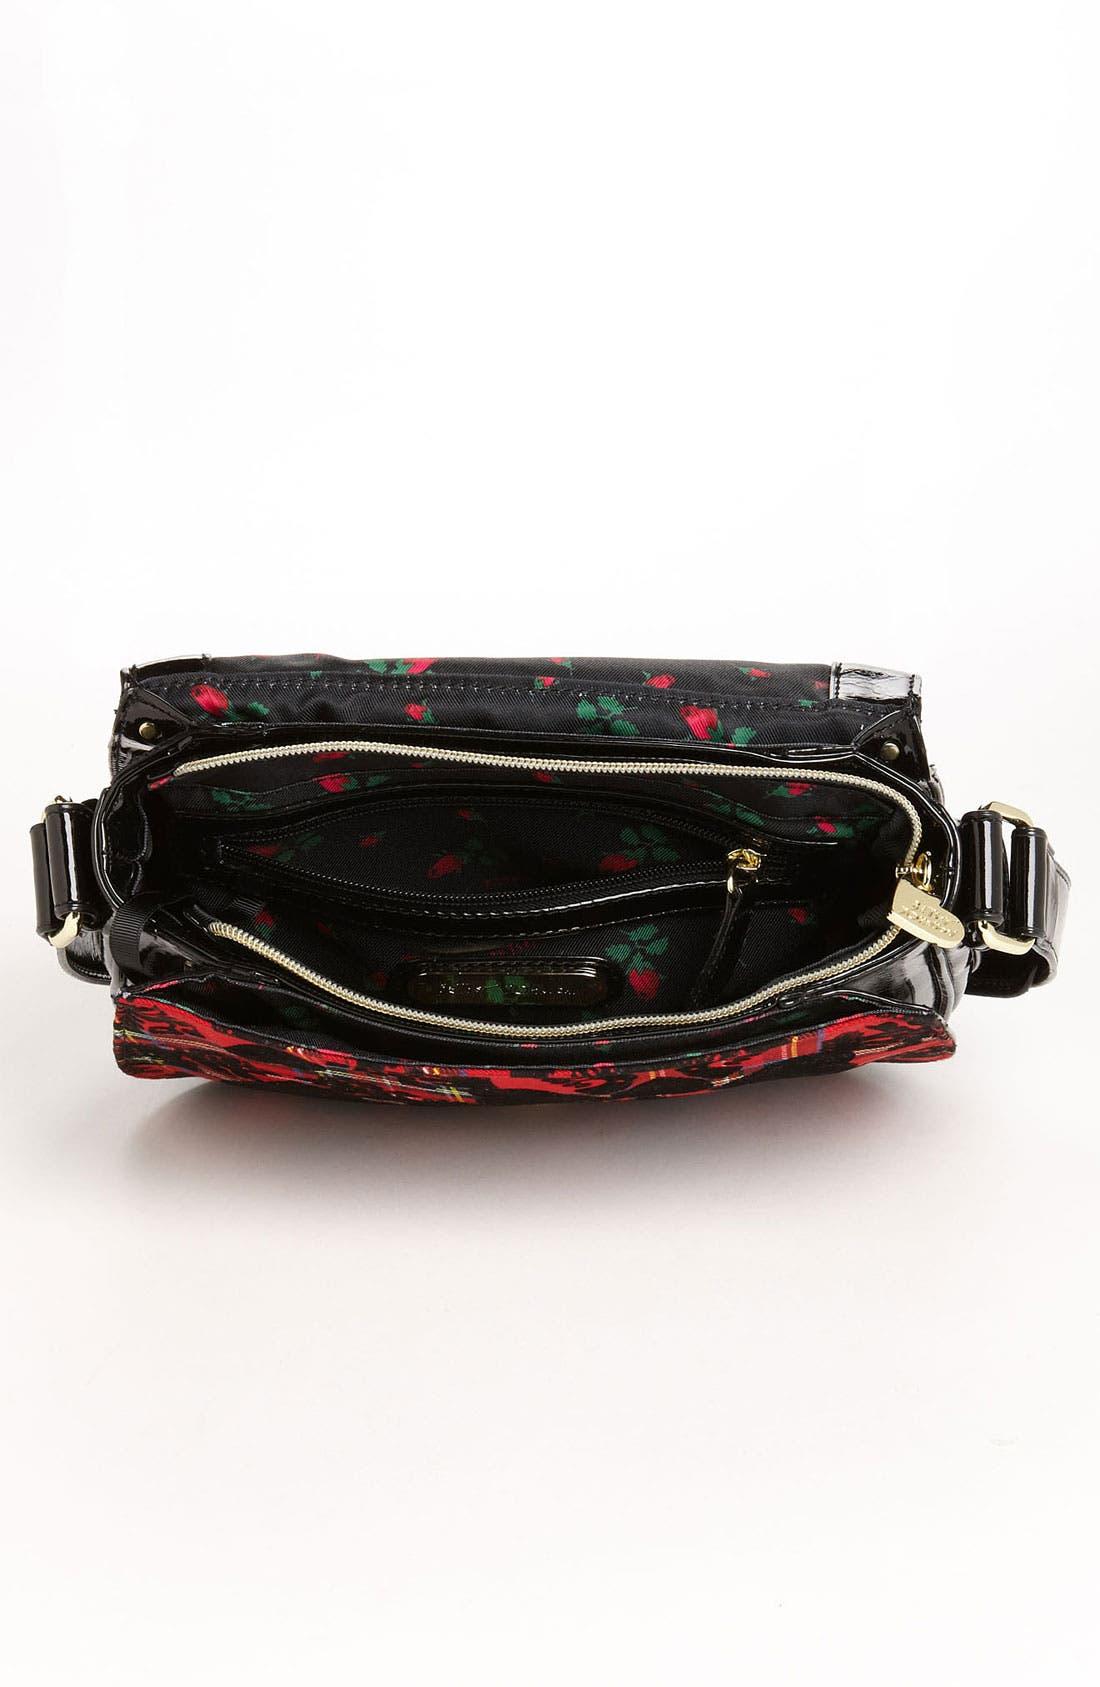 Alternate Image 3  - Betsey Johnson 'School of Hearts' Crossbody Bag